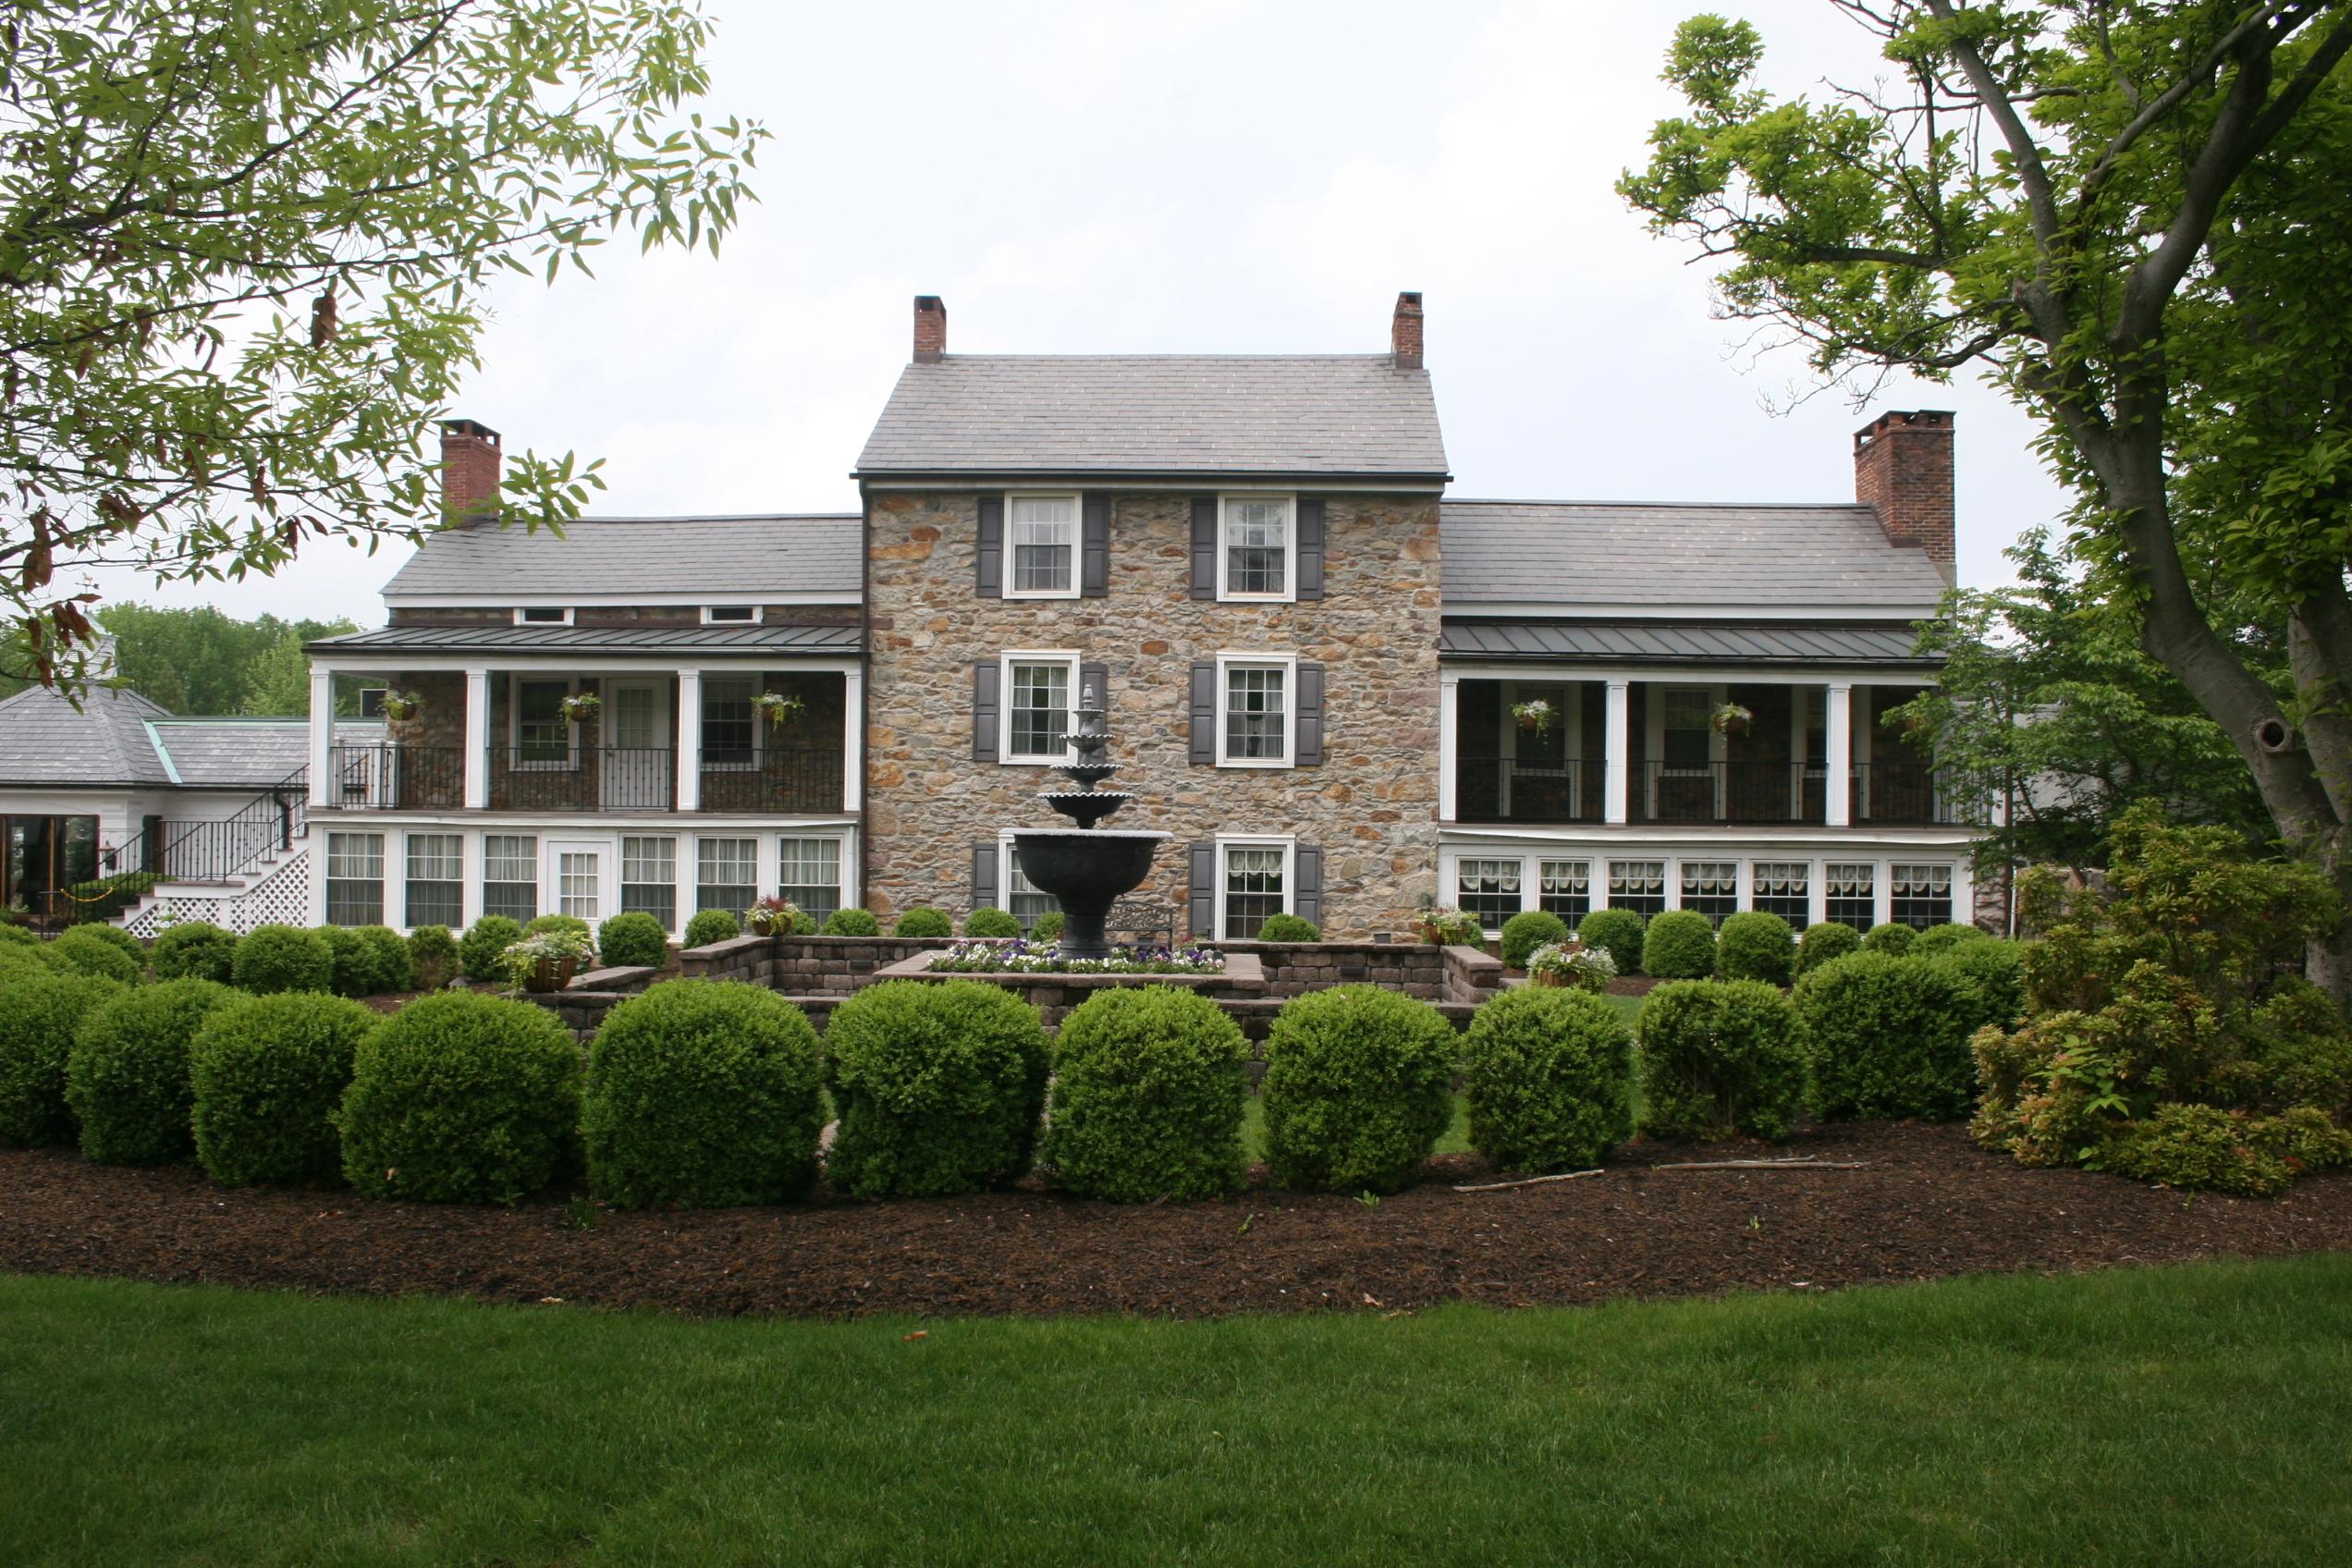 hampton, nj wedding venues - the farmhouse at the grand colonial